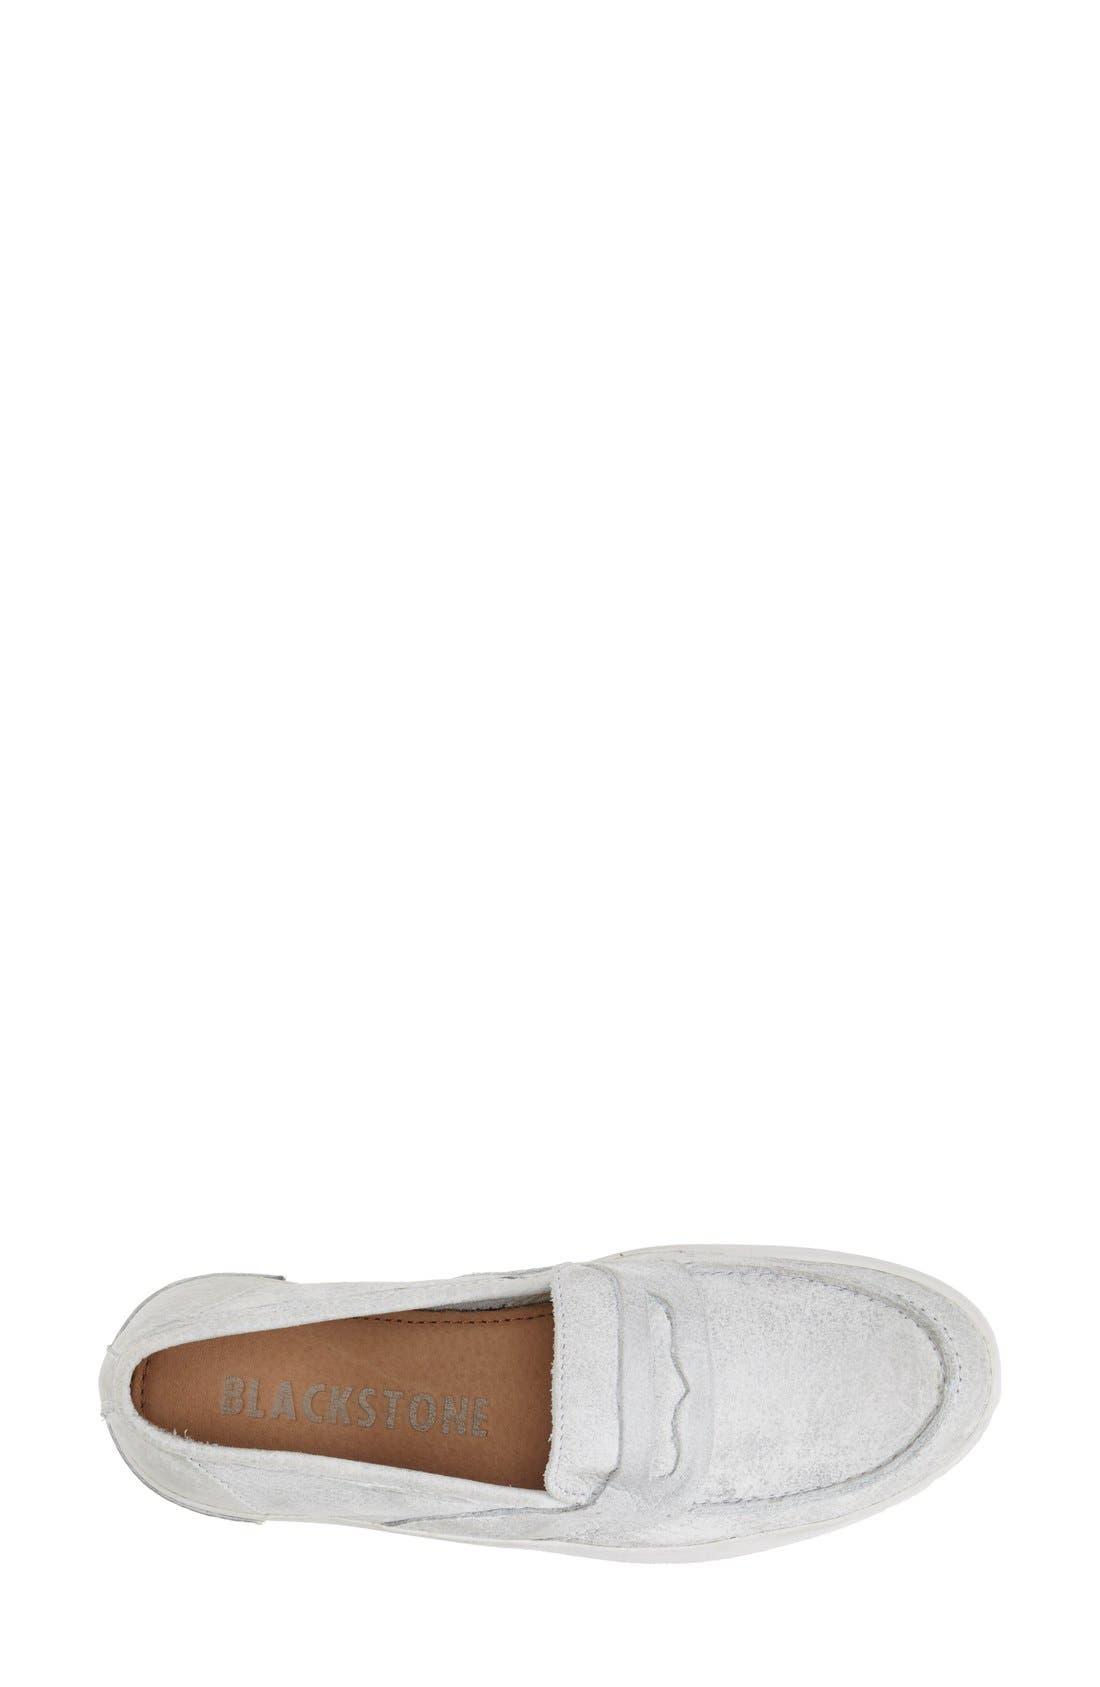 Alternate Image 3  - Blackstone 'JL23' Slip-On Sneaker (Women)